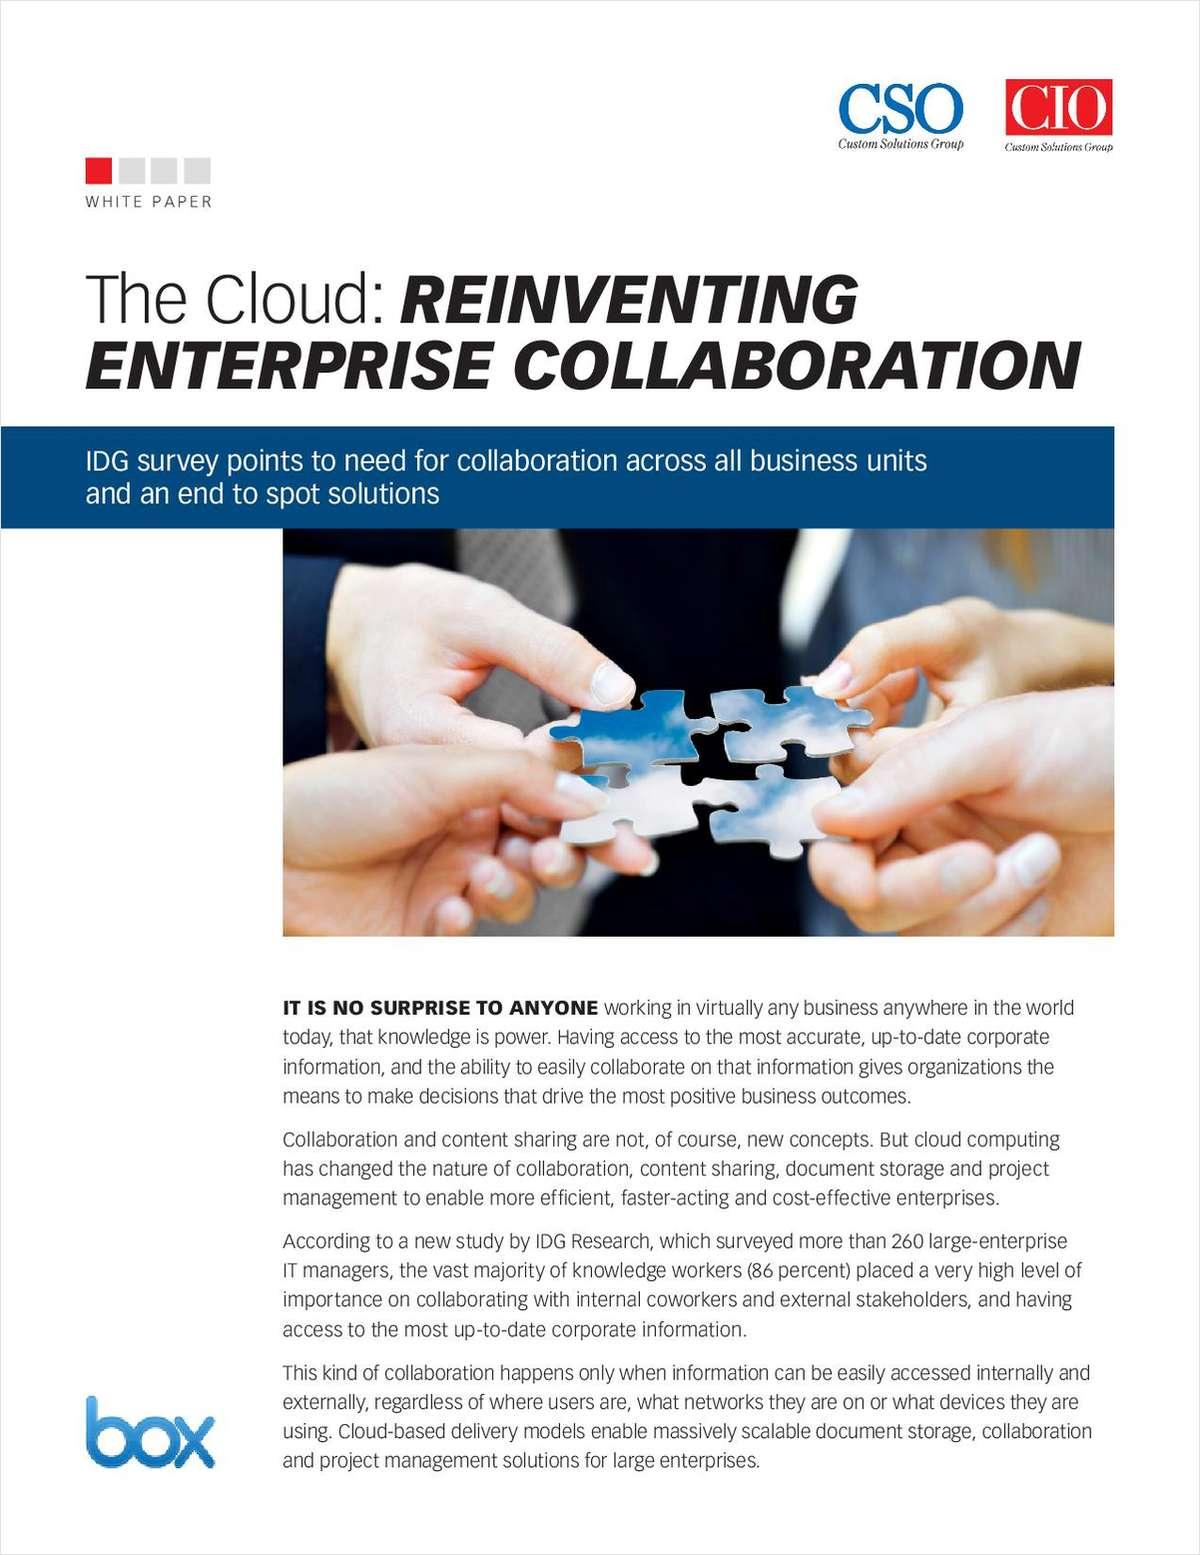 The Cloud: Reinventing Enterprise Collaboration